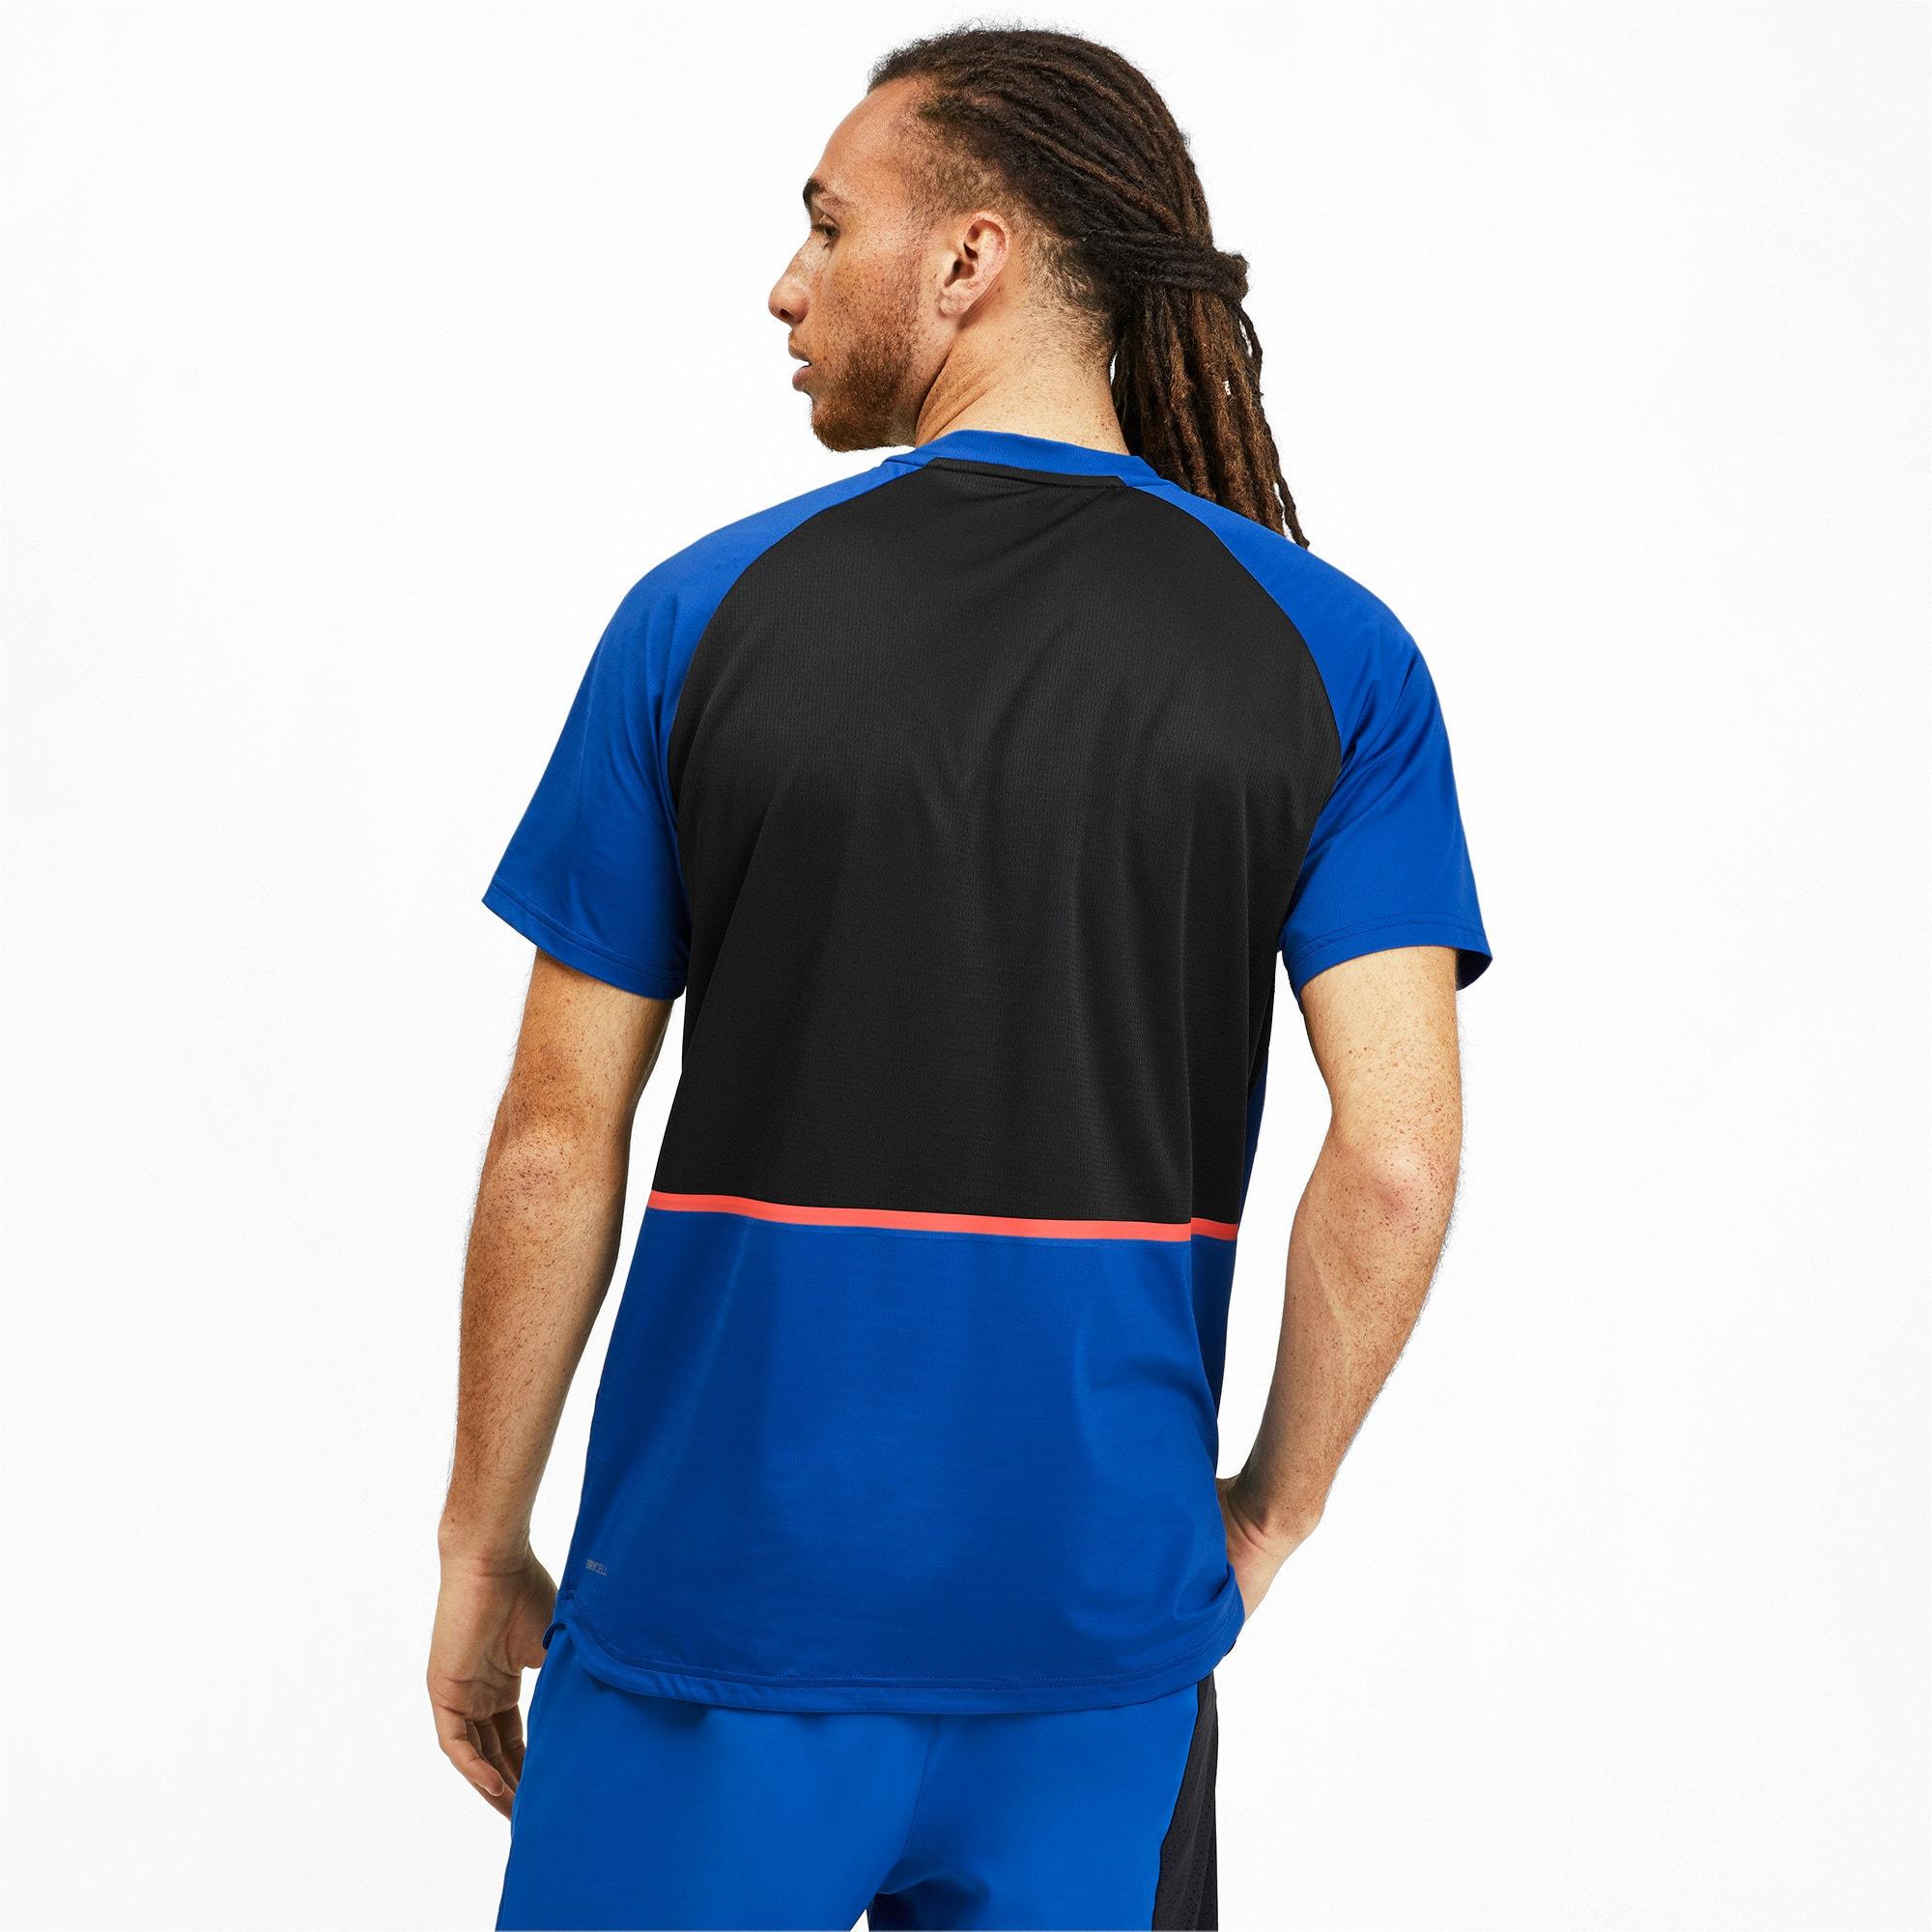 Thumbnail 2 of Power BND T-shirt voor heren, Galaxy Blue-Puma Black, medium